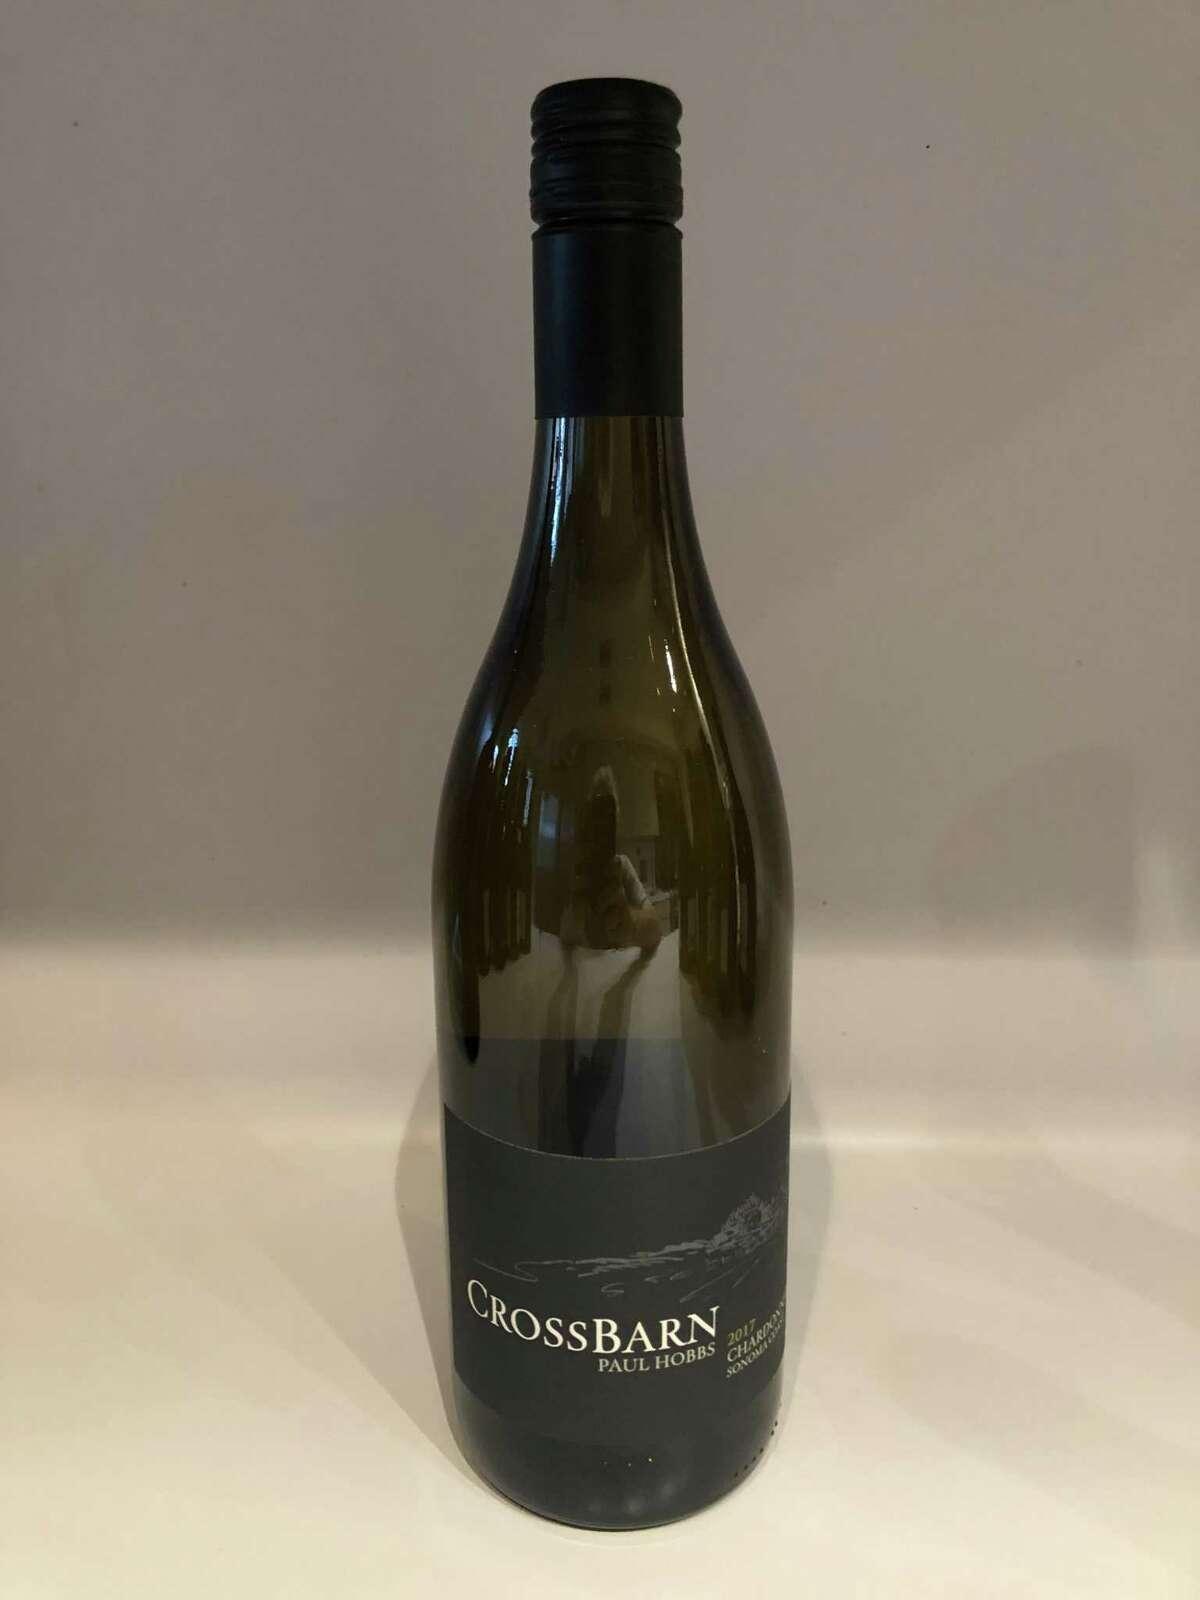 2017 Paul Hobbs CrossBarn Chardonnay